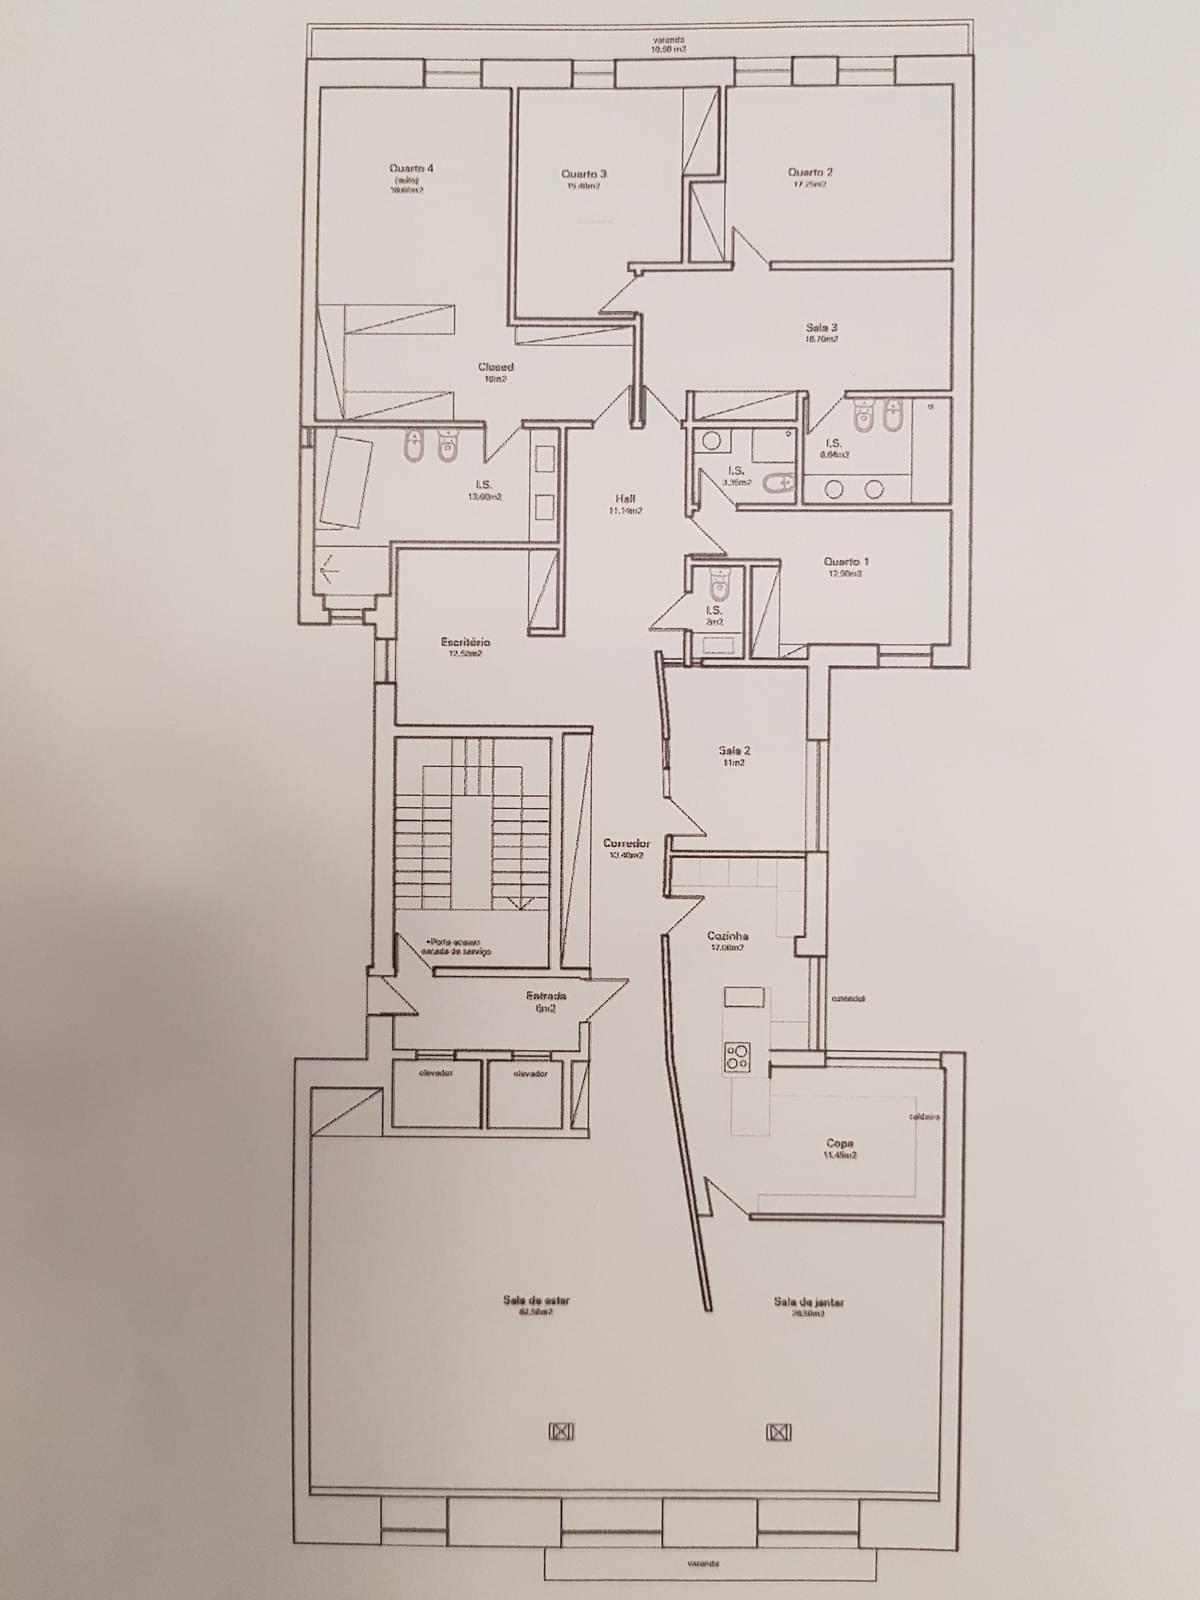 pf18758-apartamento-t6-lisboa-78b79ea5-b147-431c-91ae-31dc31f7d199